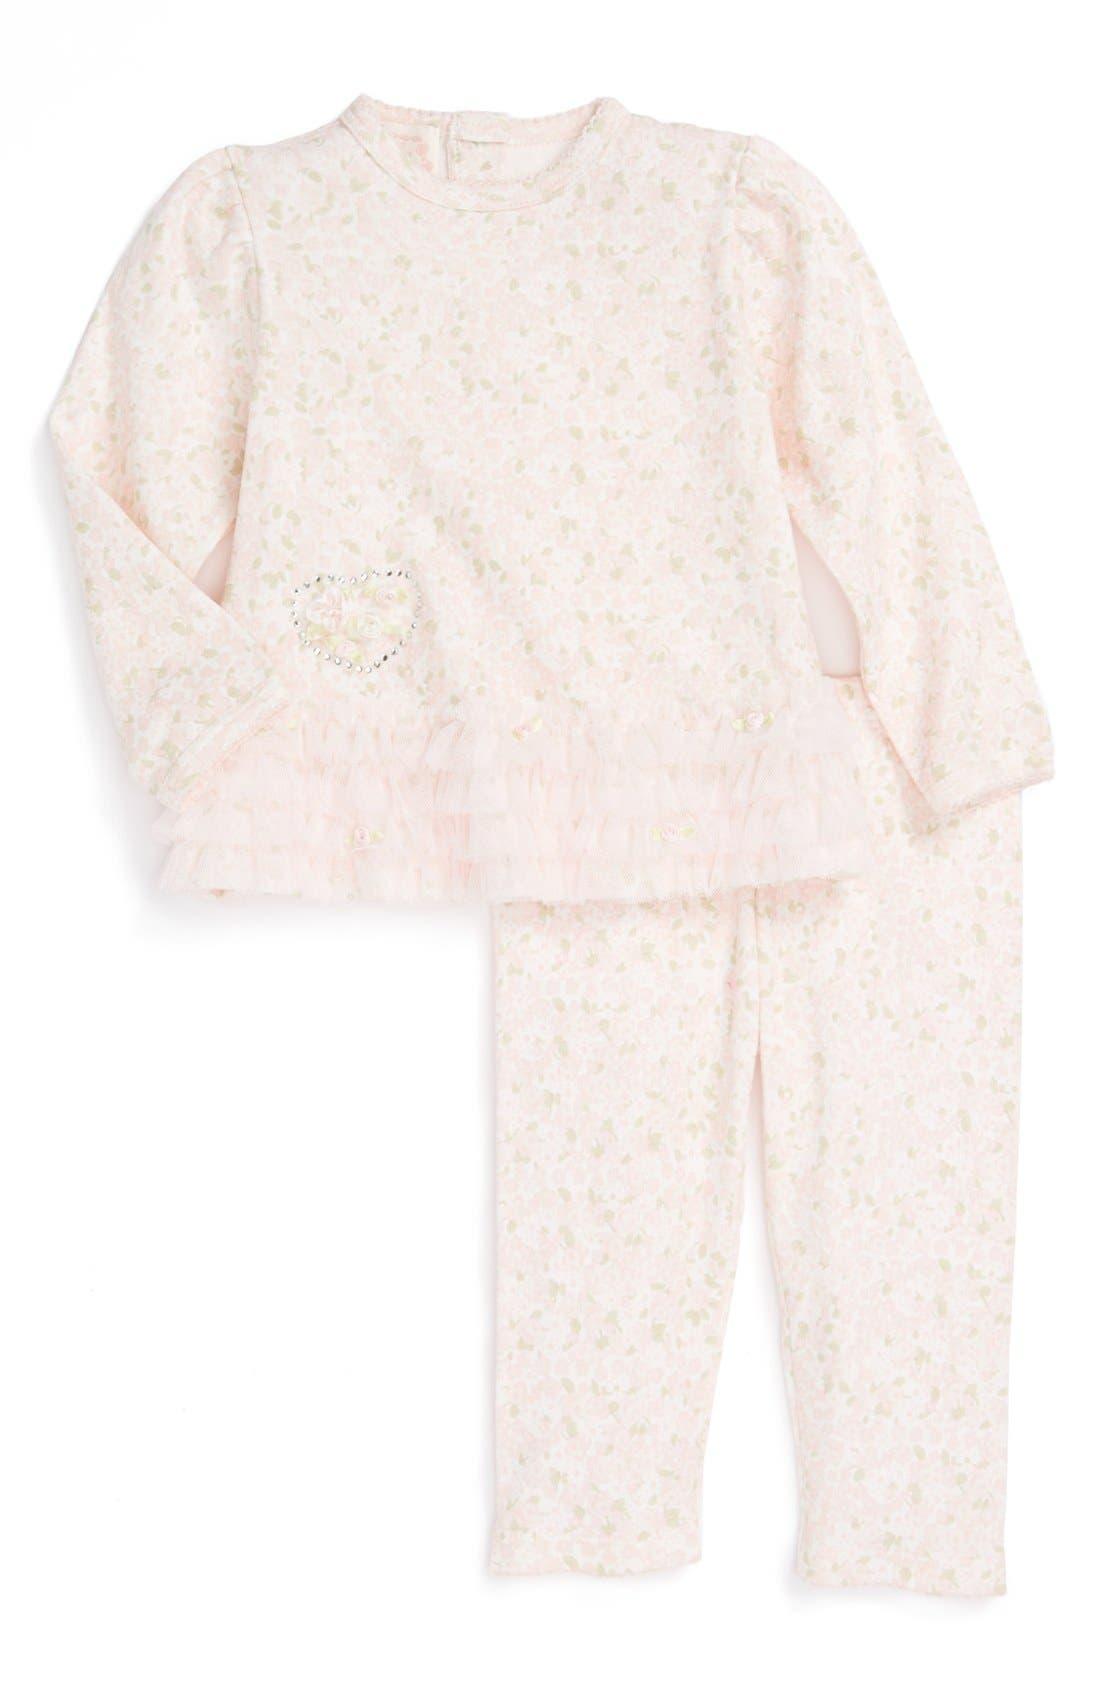 Main Image - Biscotti Top & Pants (Baby Girls)